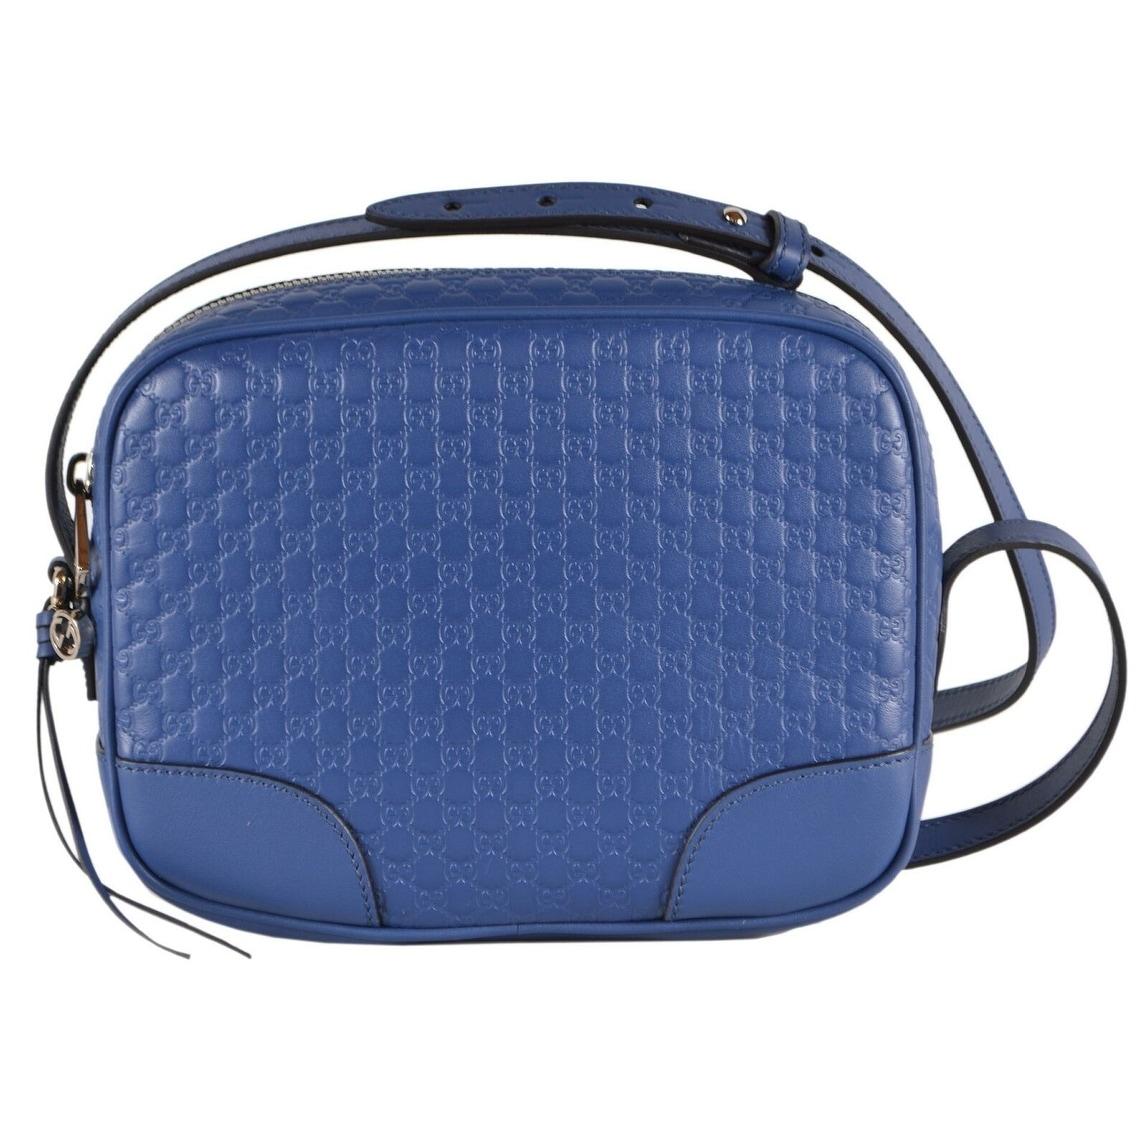 Shop Gucci Caspian Blue Leather Micro Gg Guccissima Bree Crossbody Camera Bag On Sale Overstock 30587514